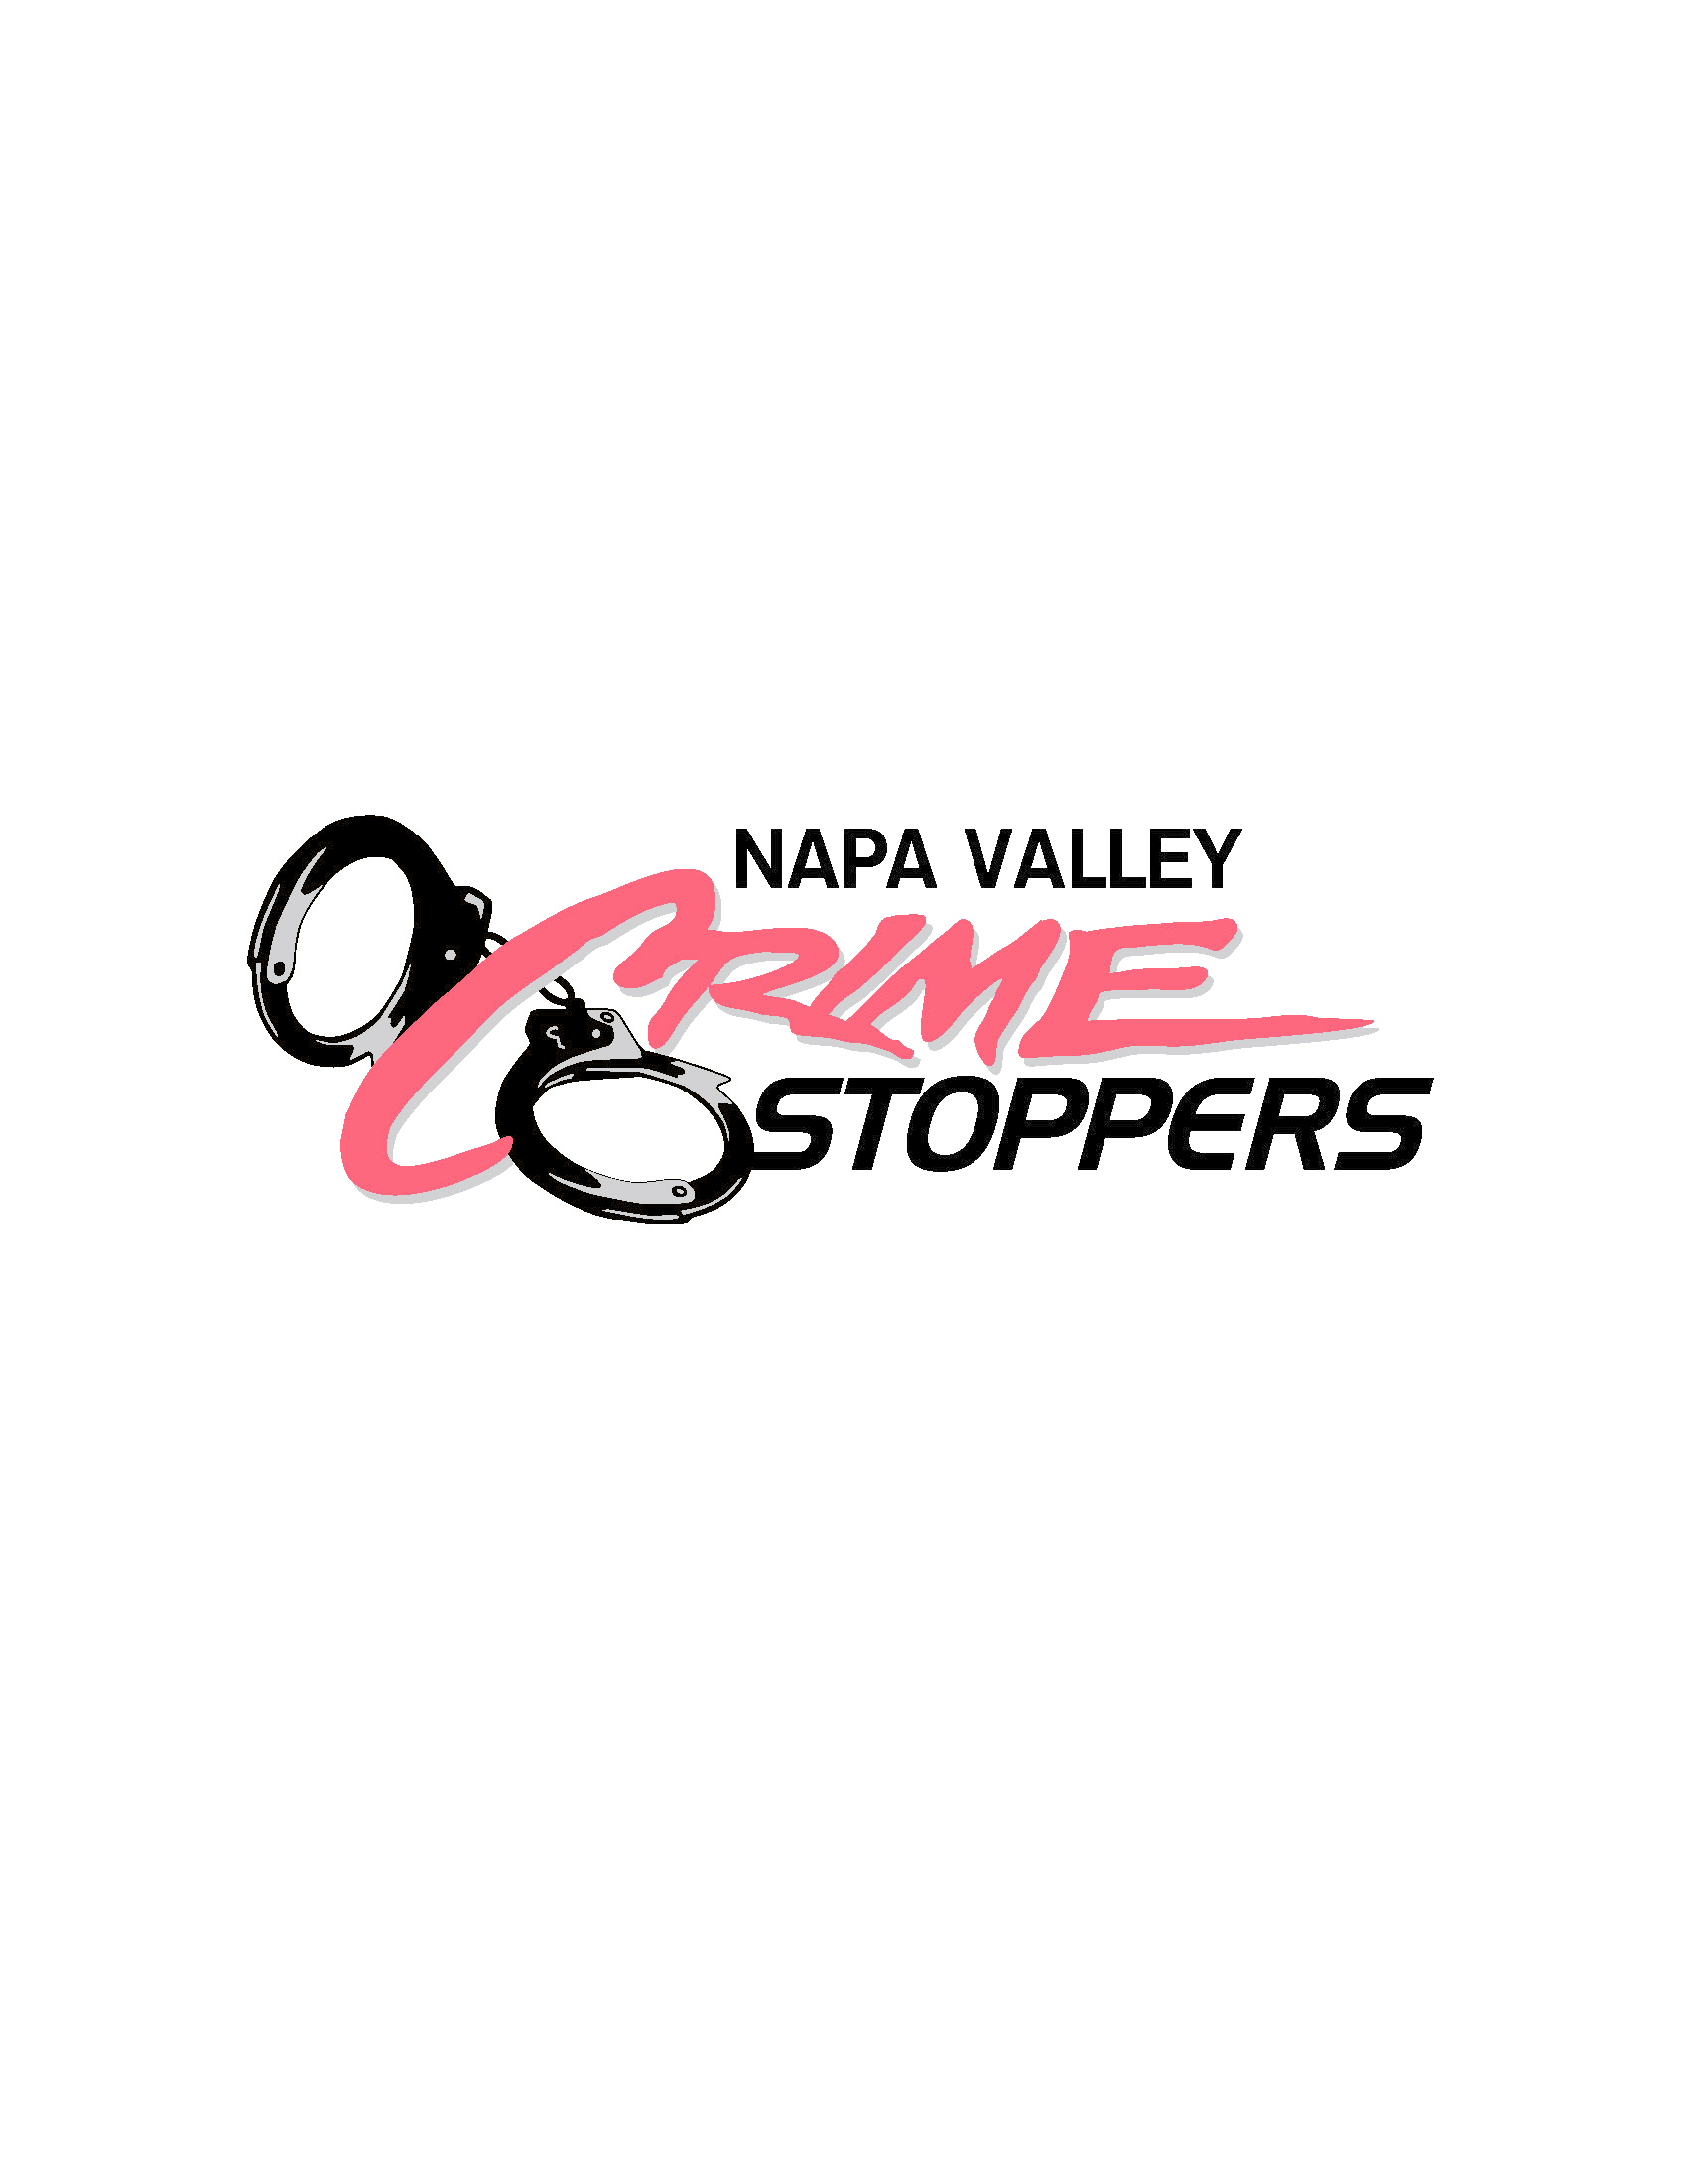 FUGITIVE FRIDAY UPDATE: Suspects Arrested, Warrants Recalled | Napa